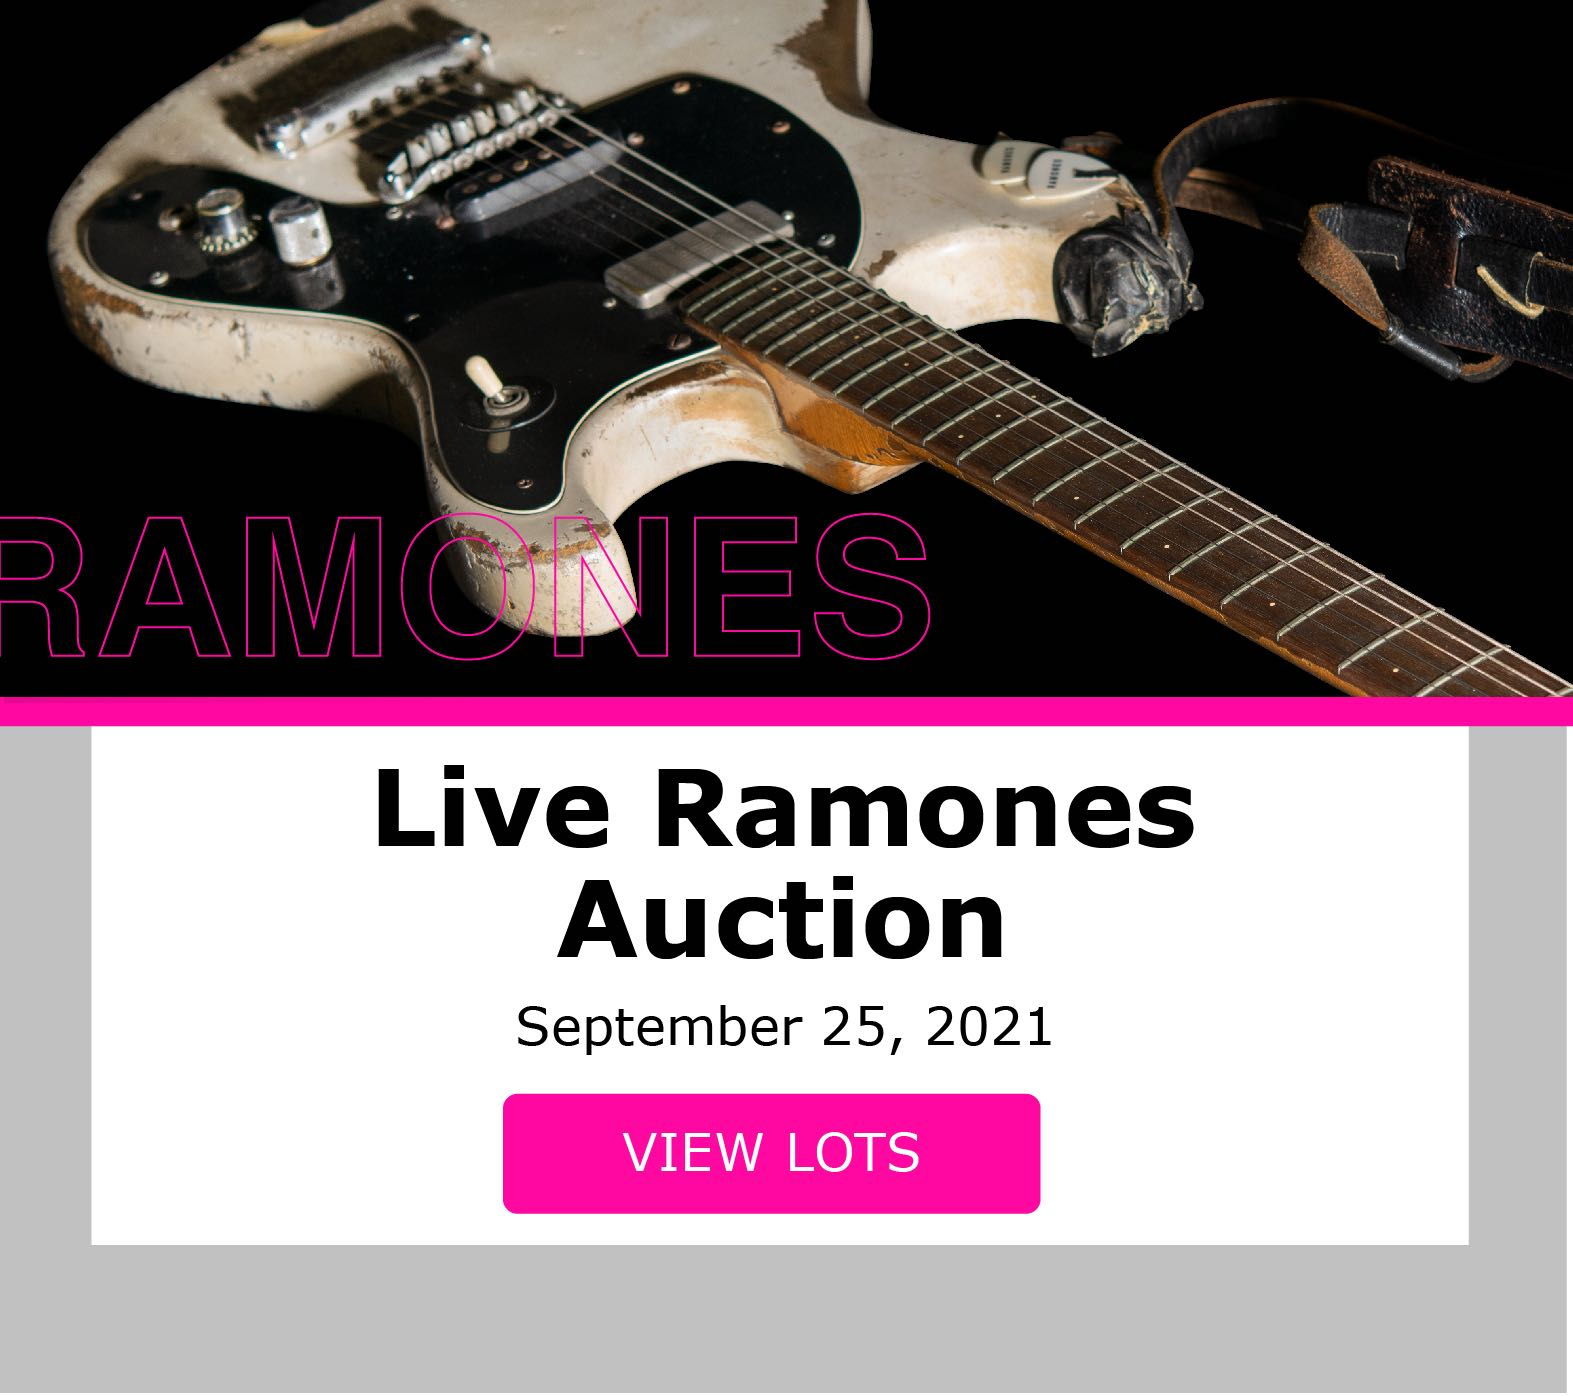 626 : The Ramones collection of Daniel Rey